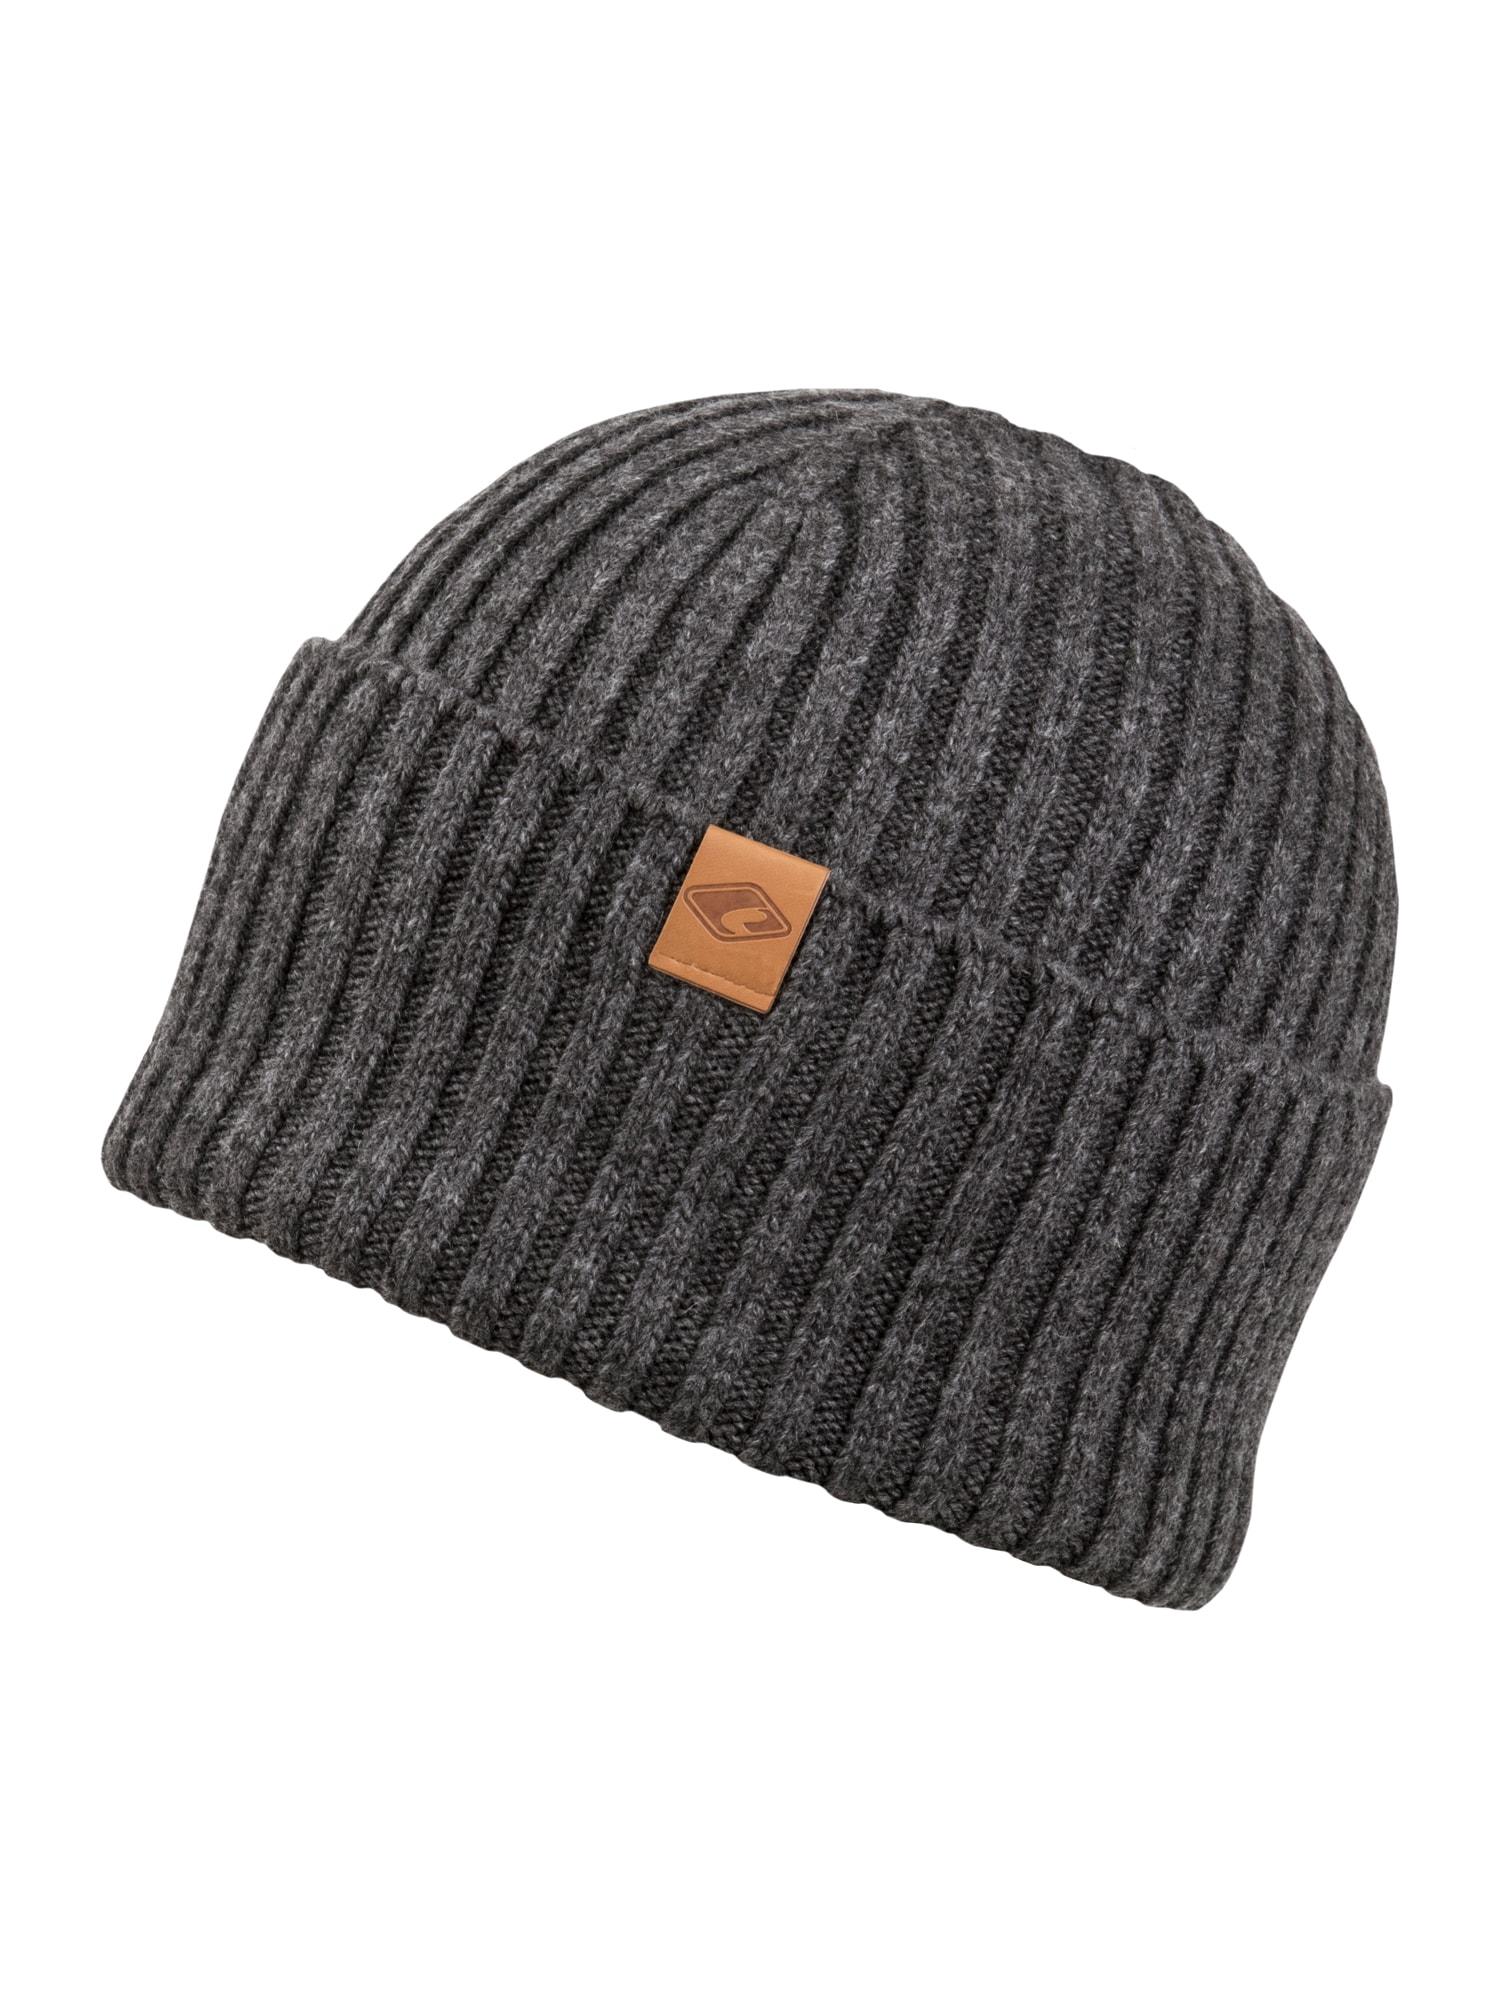 chillouts Megzta kepurė 'Justin' tamsiai pilka